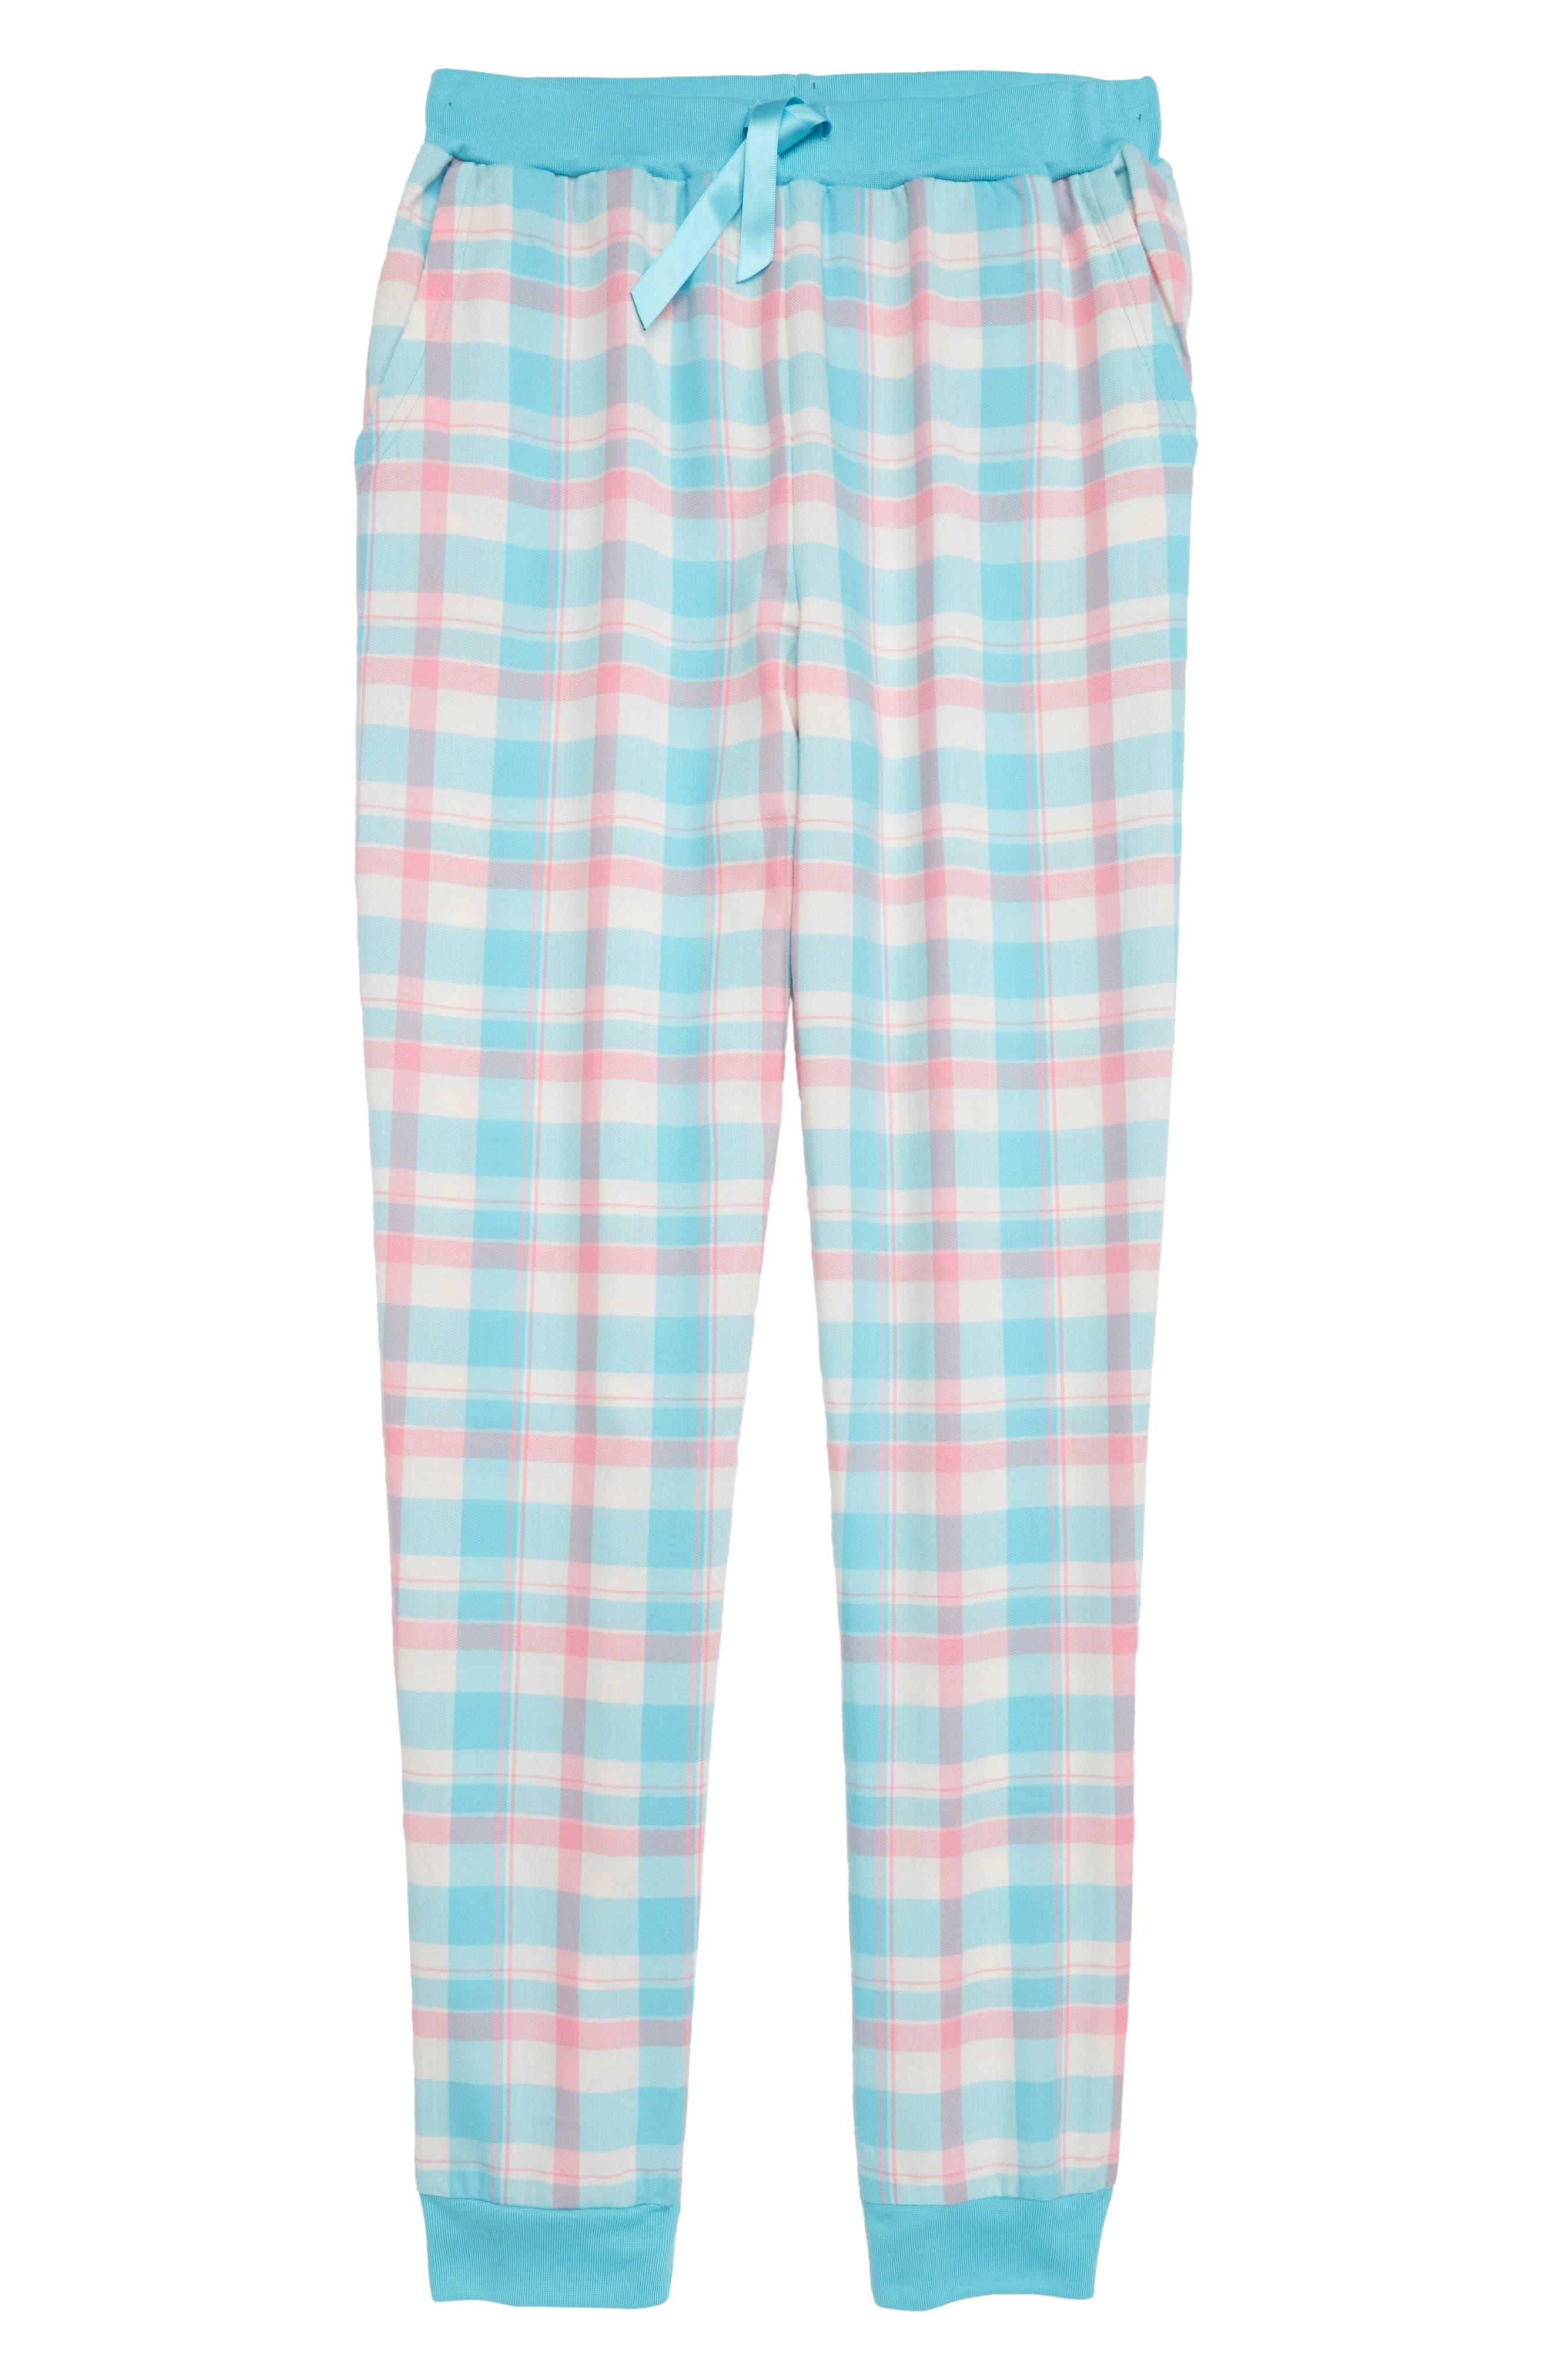 Flannel Pajama Pants,                             Main thumbnail 1, color,                             TEAL CAPRI PLAID